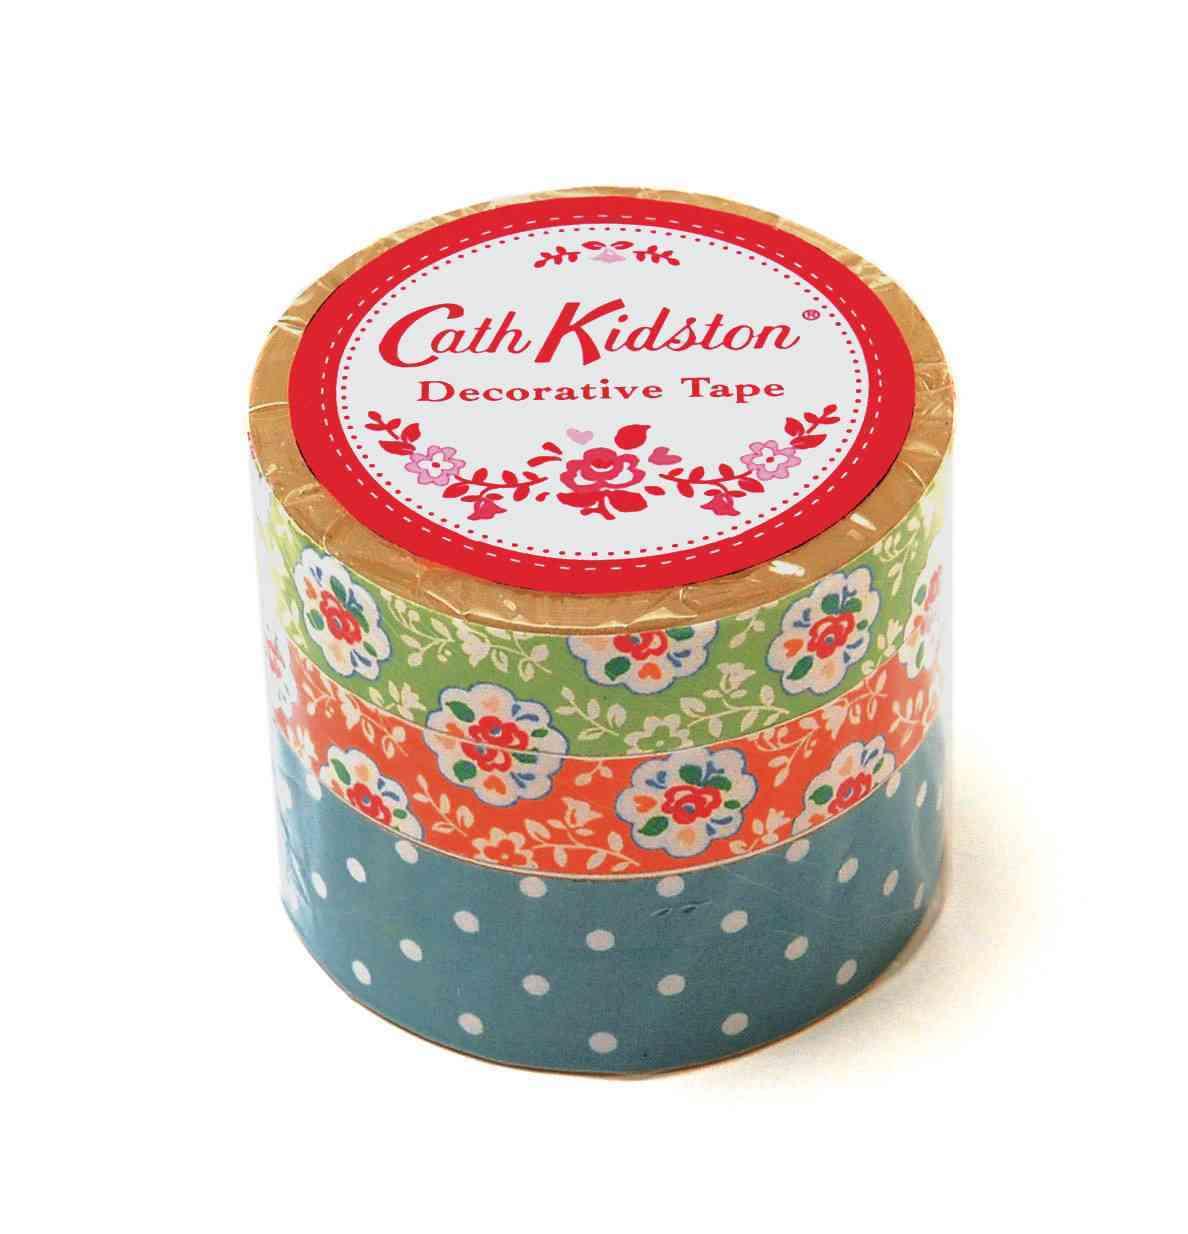 Cath Kidston Decorative Tape (Novelty book)